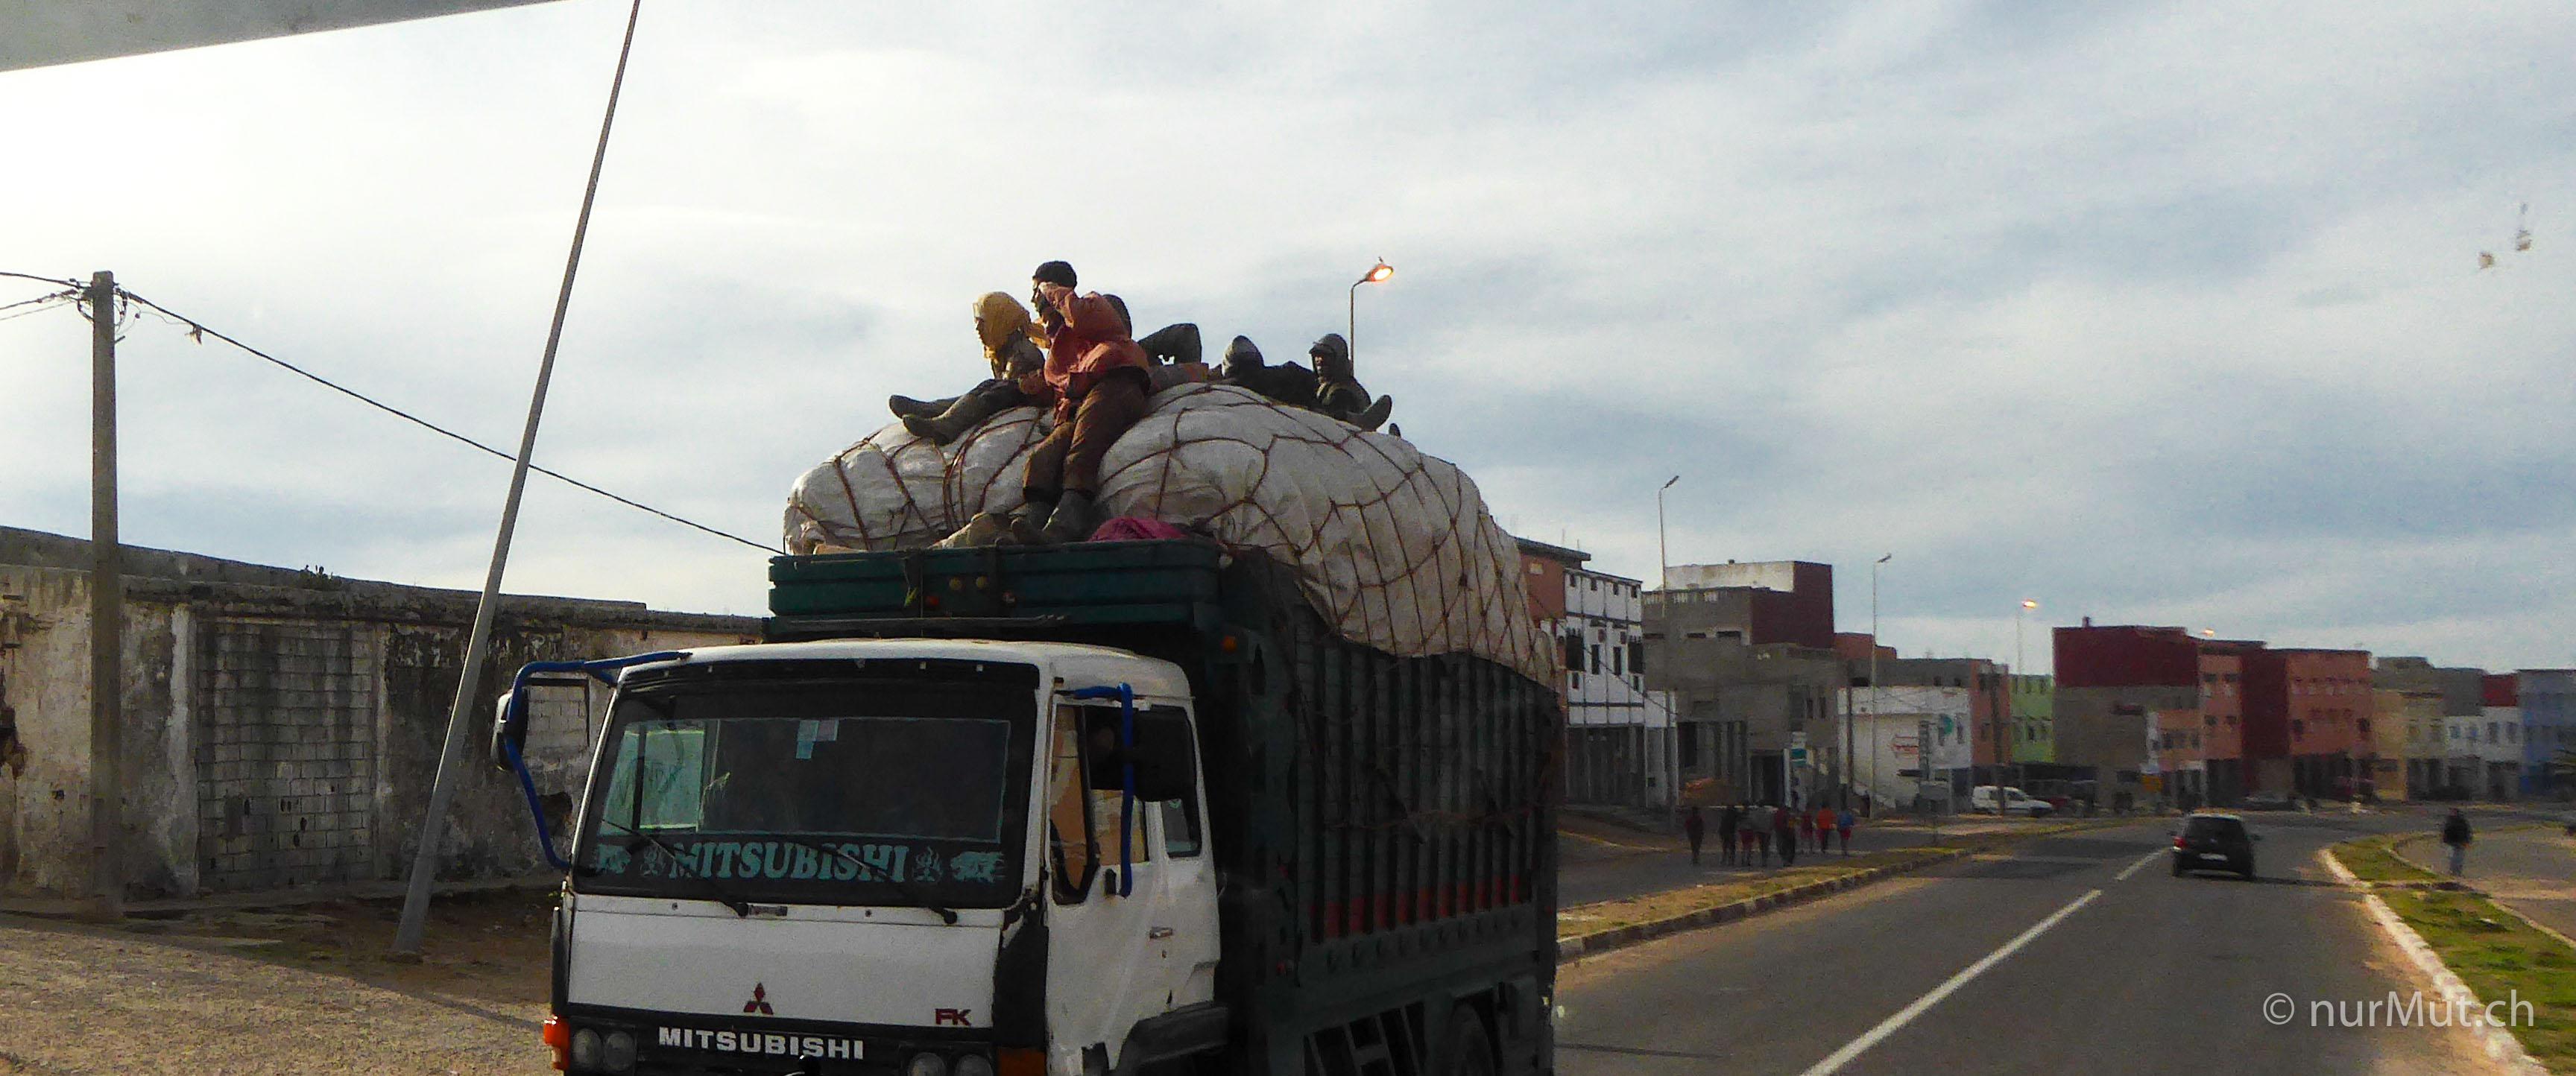 mit hund und reisemobil nach marokko-marokko-lkw-personentransport marokko-nurmut